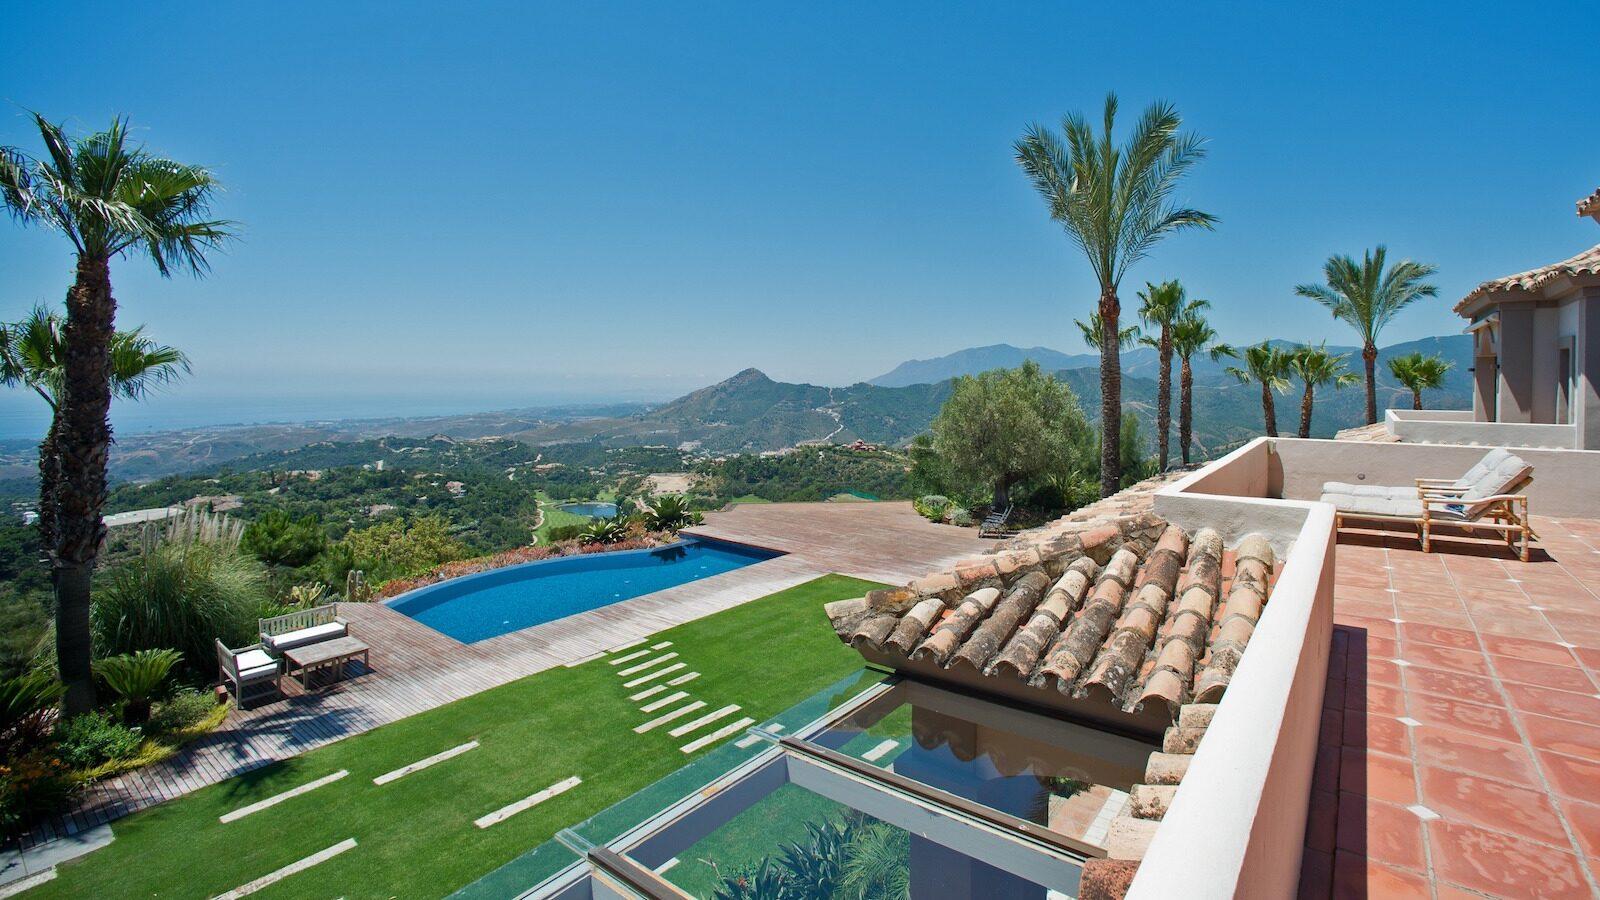 Beautiful mansion in La Zagaleta – Benahavis – Marbella